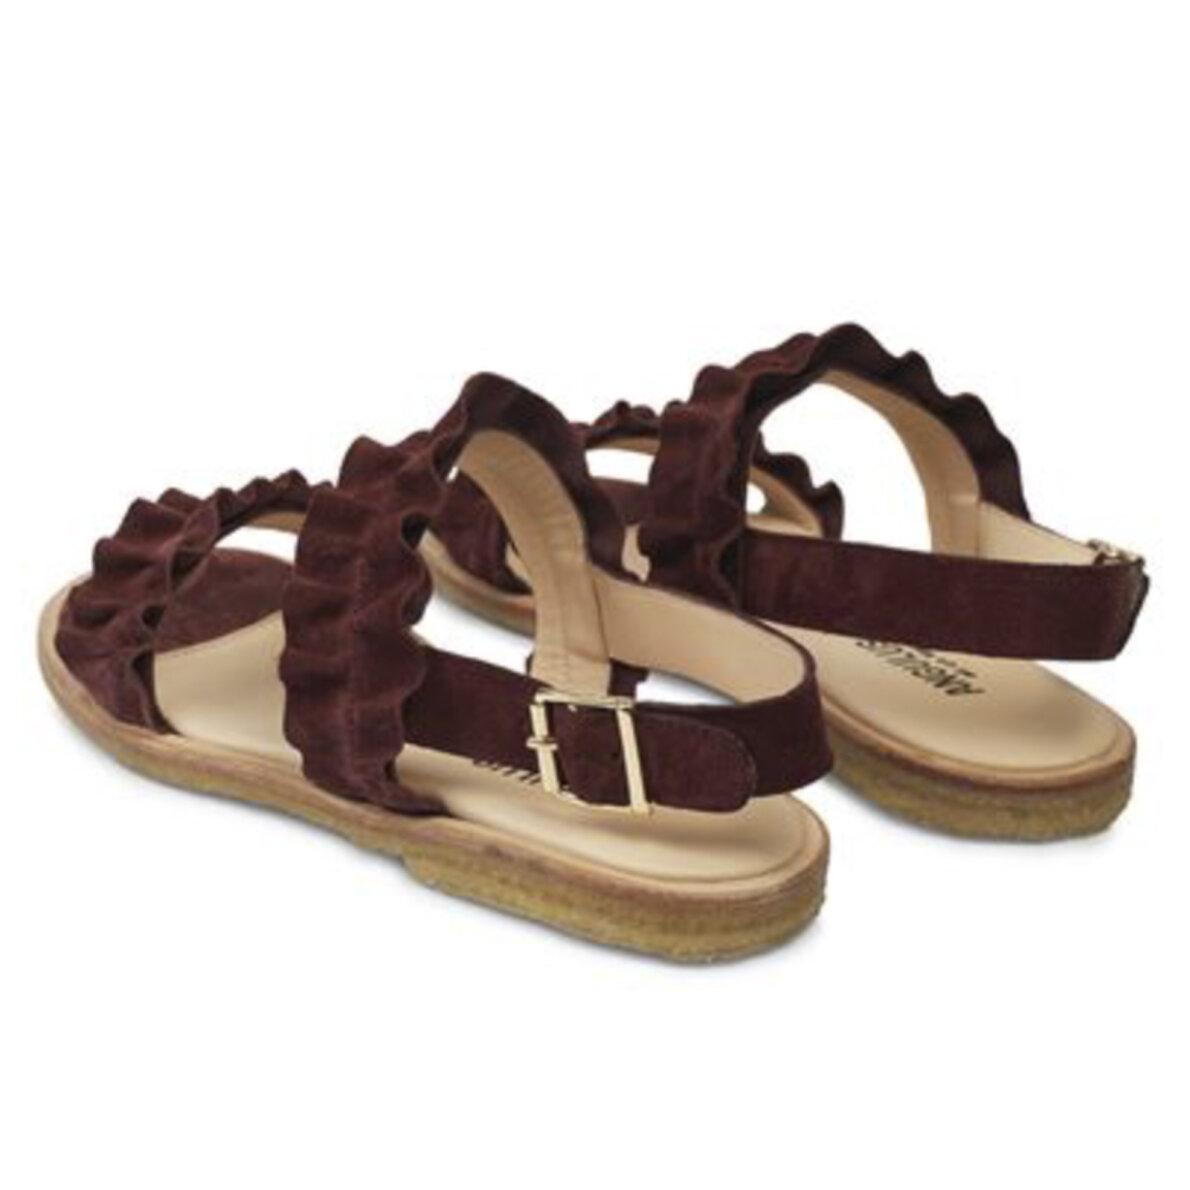 fd03469c3351 ... Angulus - Angulus 5558 bordeaux dame sandal med flæser